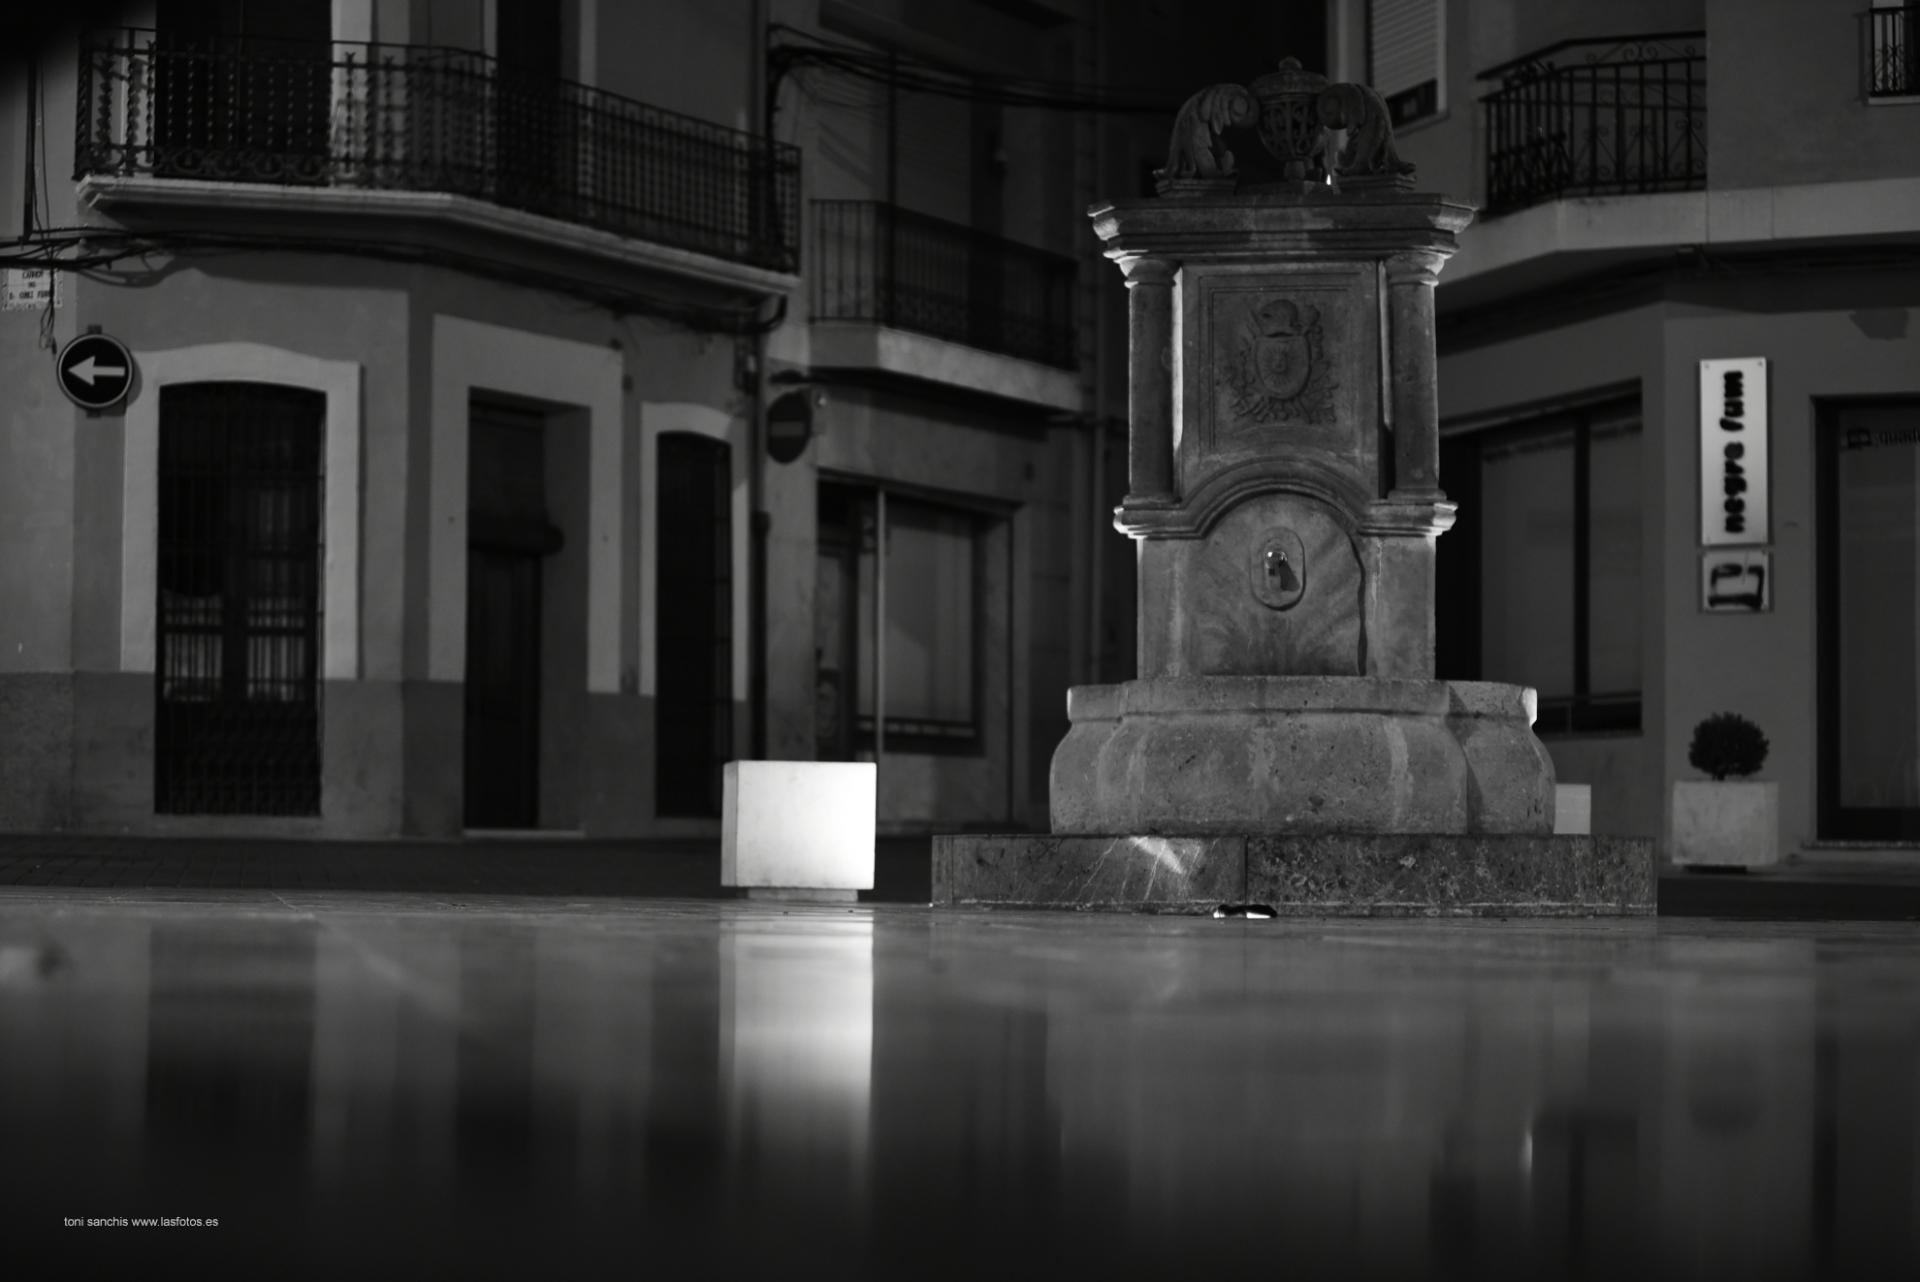 toni-sanchis-fuente-plaza-de-la-iglesia